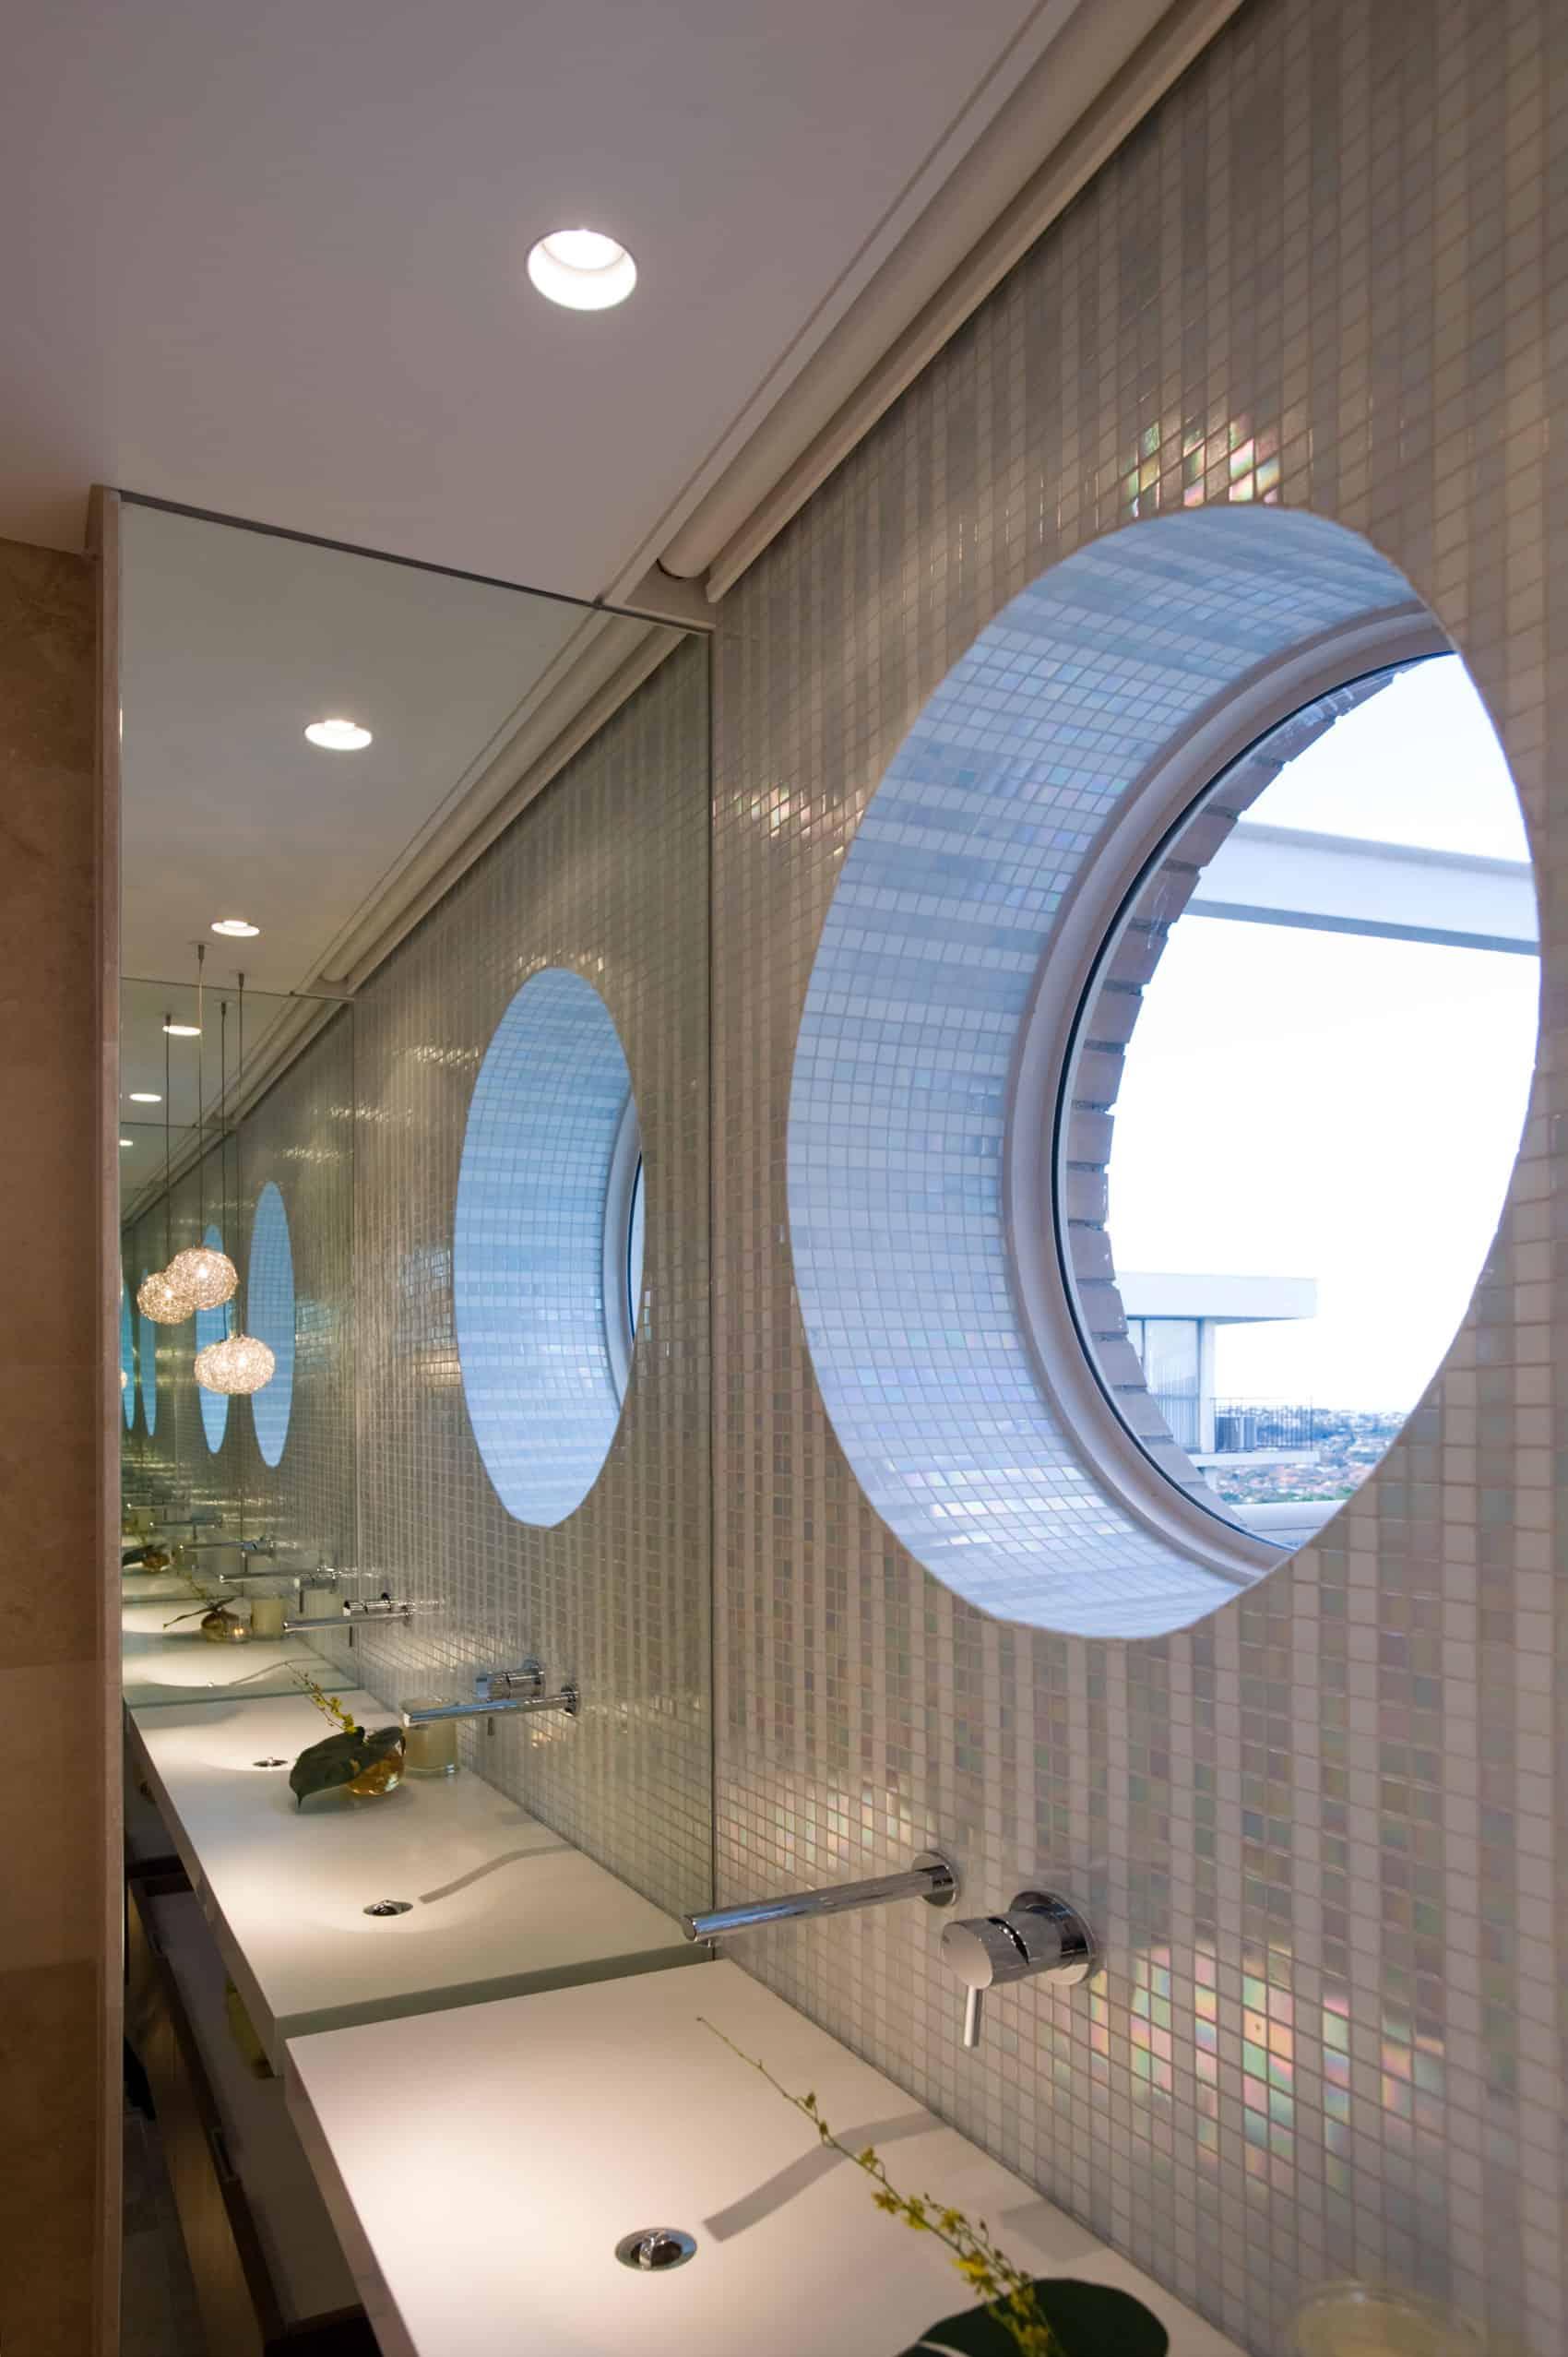 Before/After: Bondi Bathroom Remodel by Minosa Design (4)